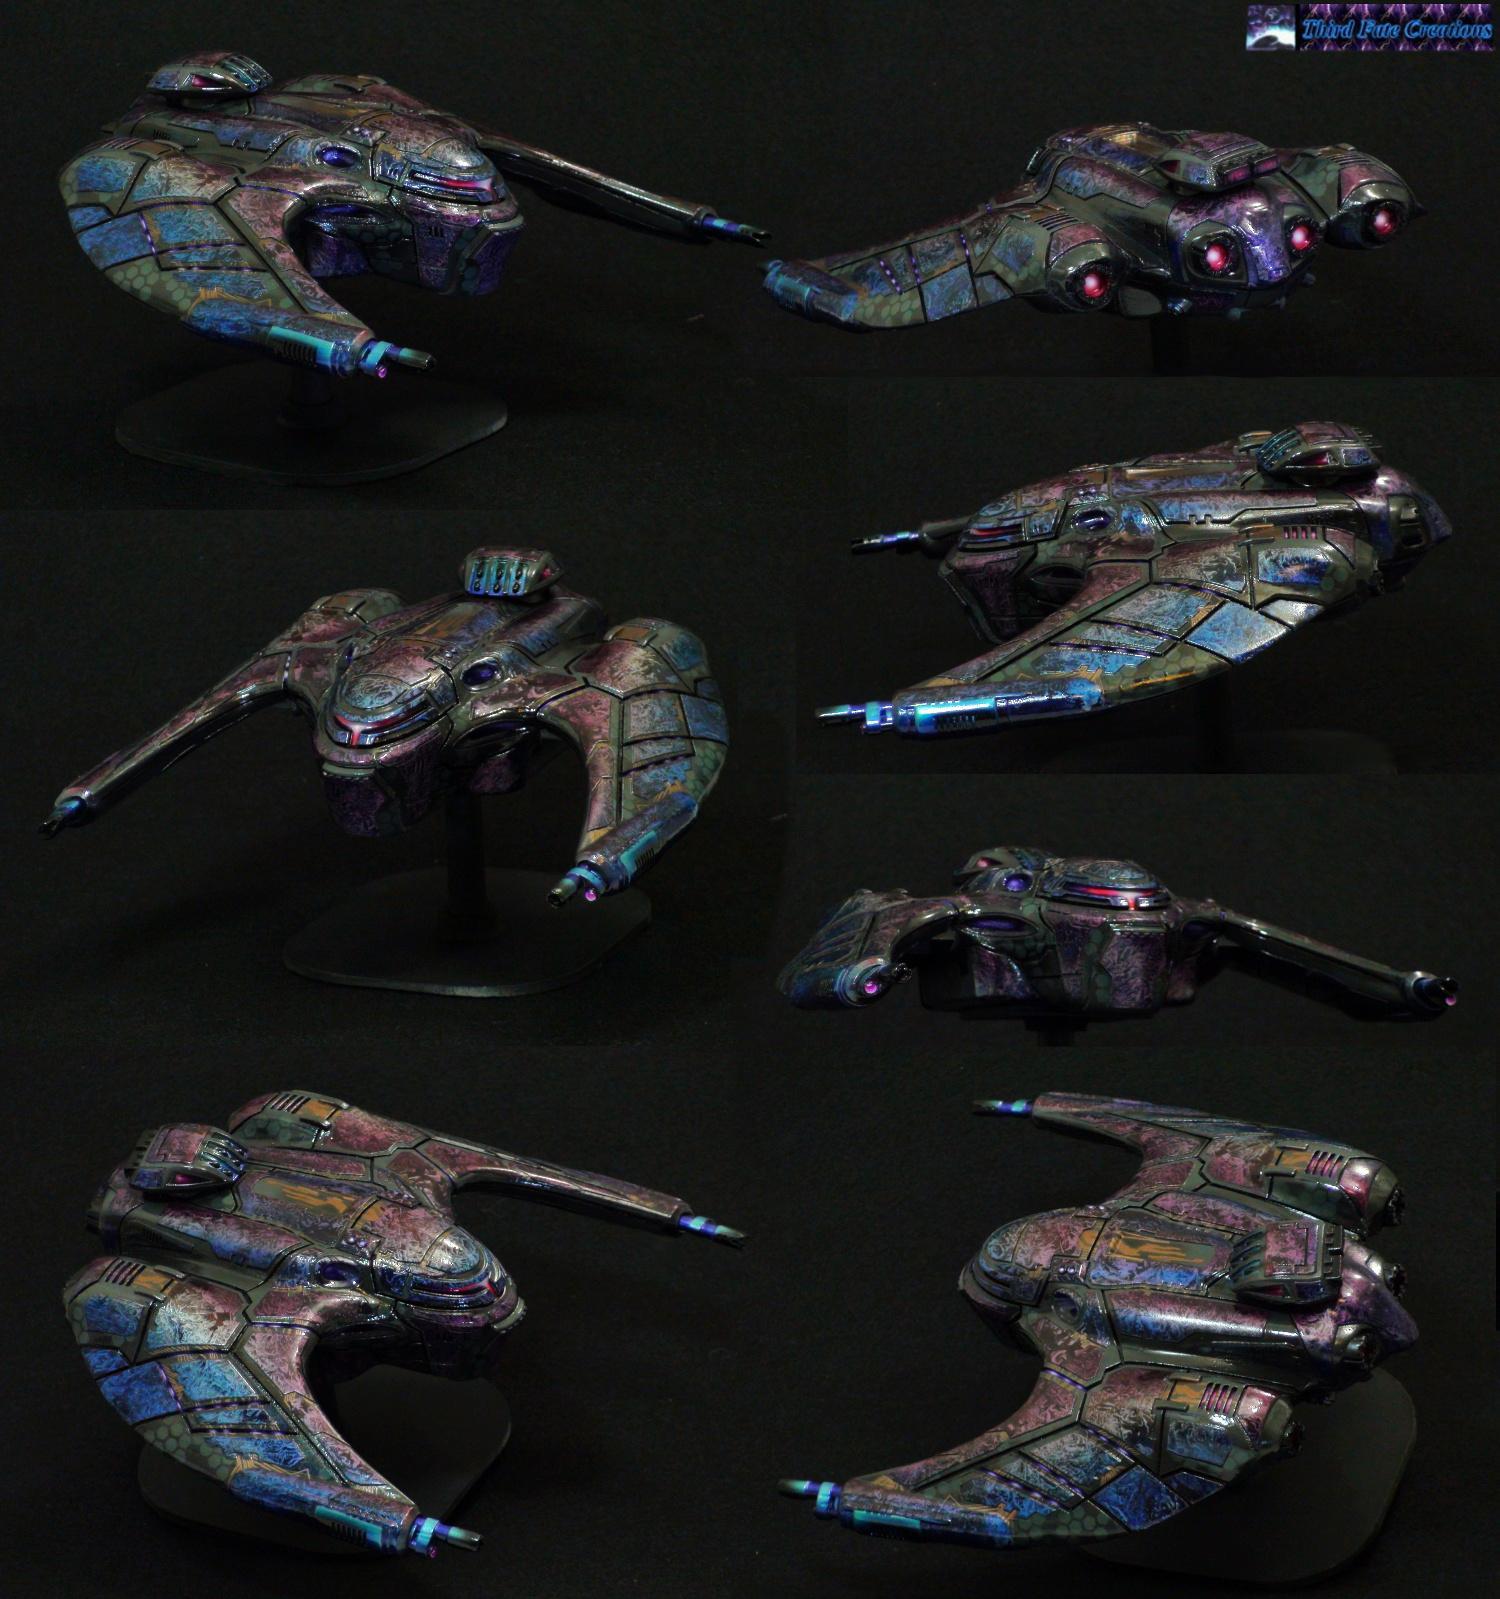 Airbrush, Cylon, Drop Ship, Dropship, Fighter, Hunter, Khurasan Miniatures, Marbling, Ship, Starship, Thirdfatecreations